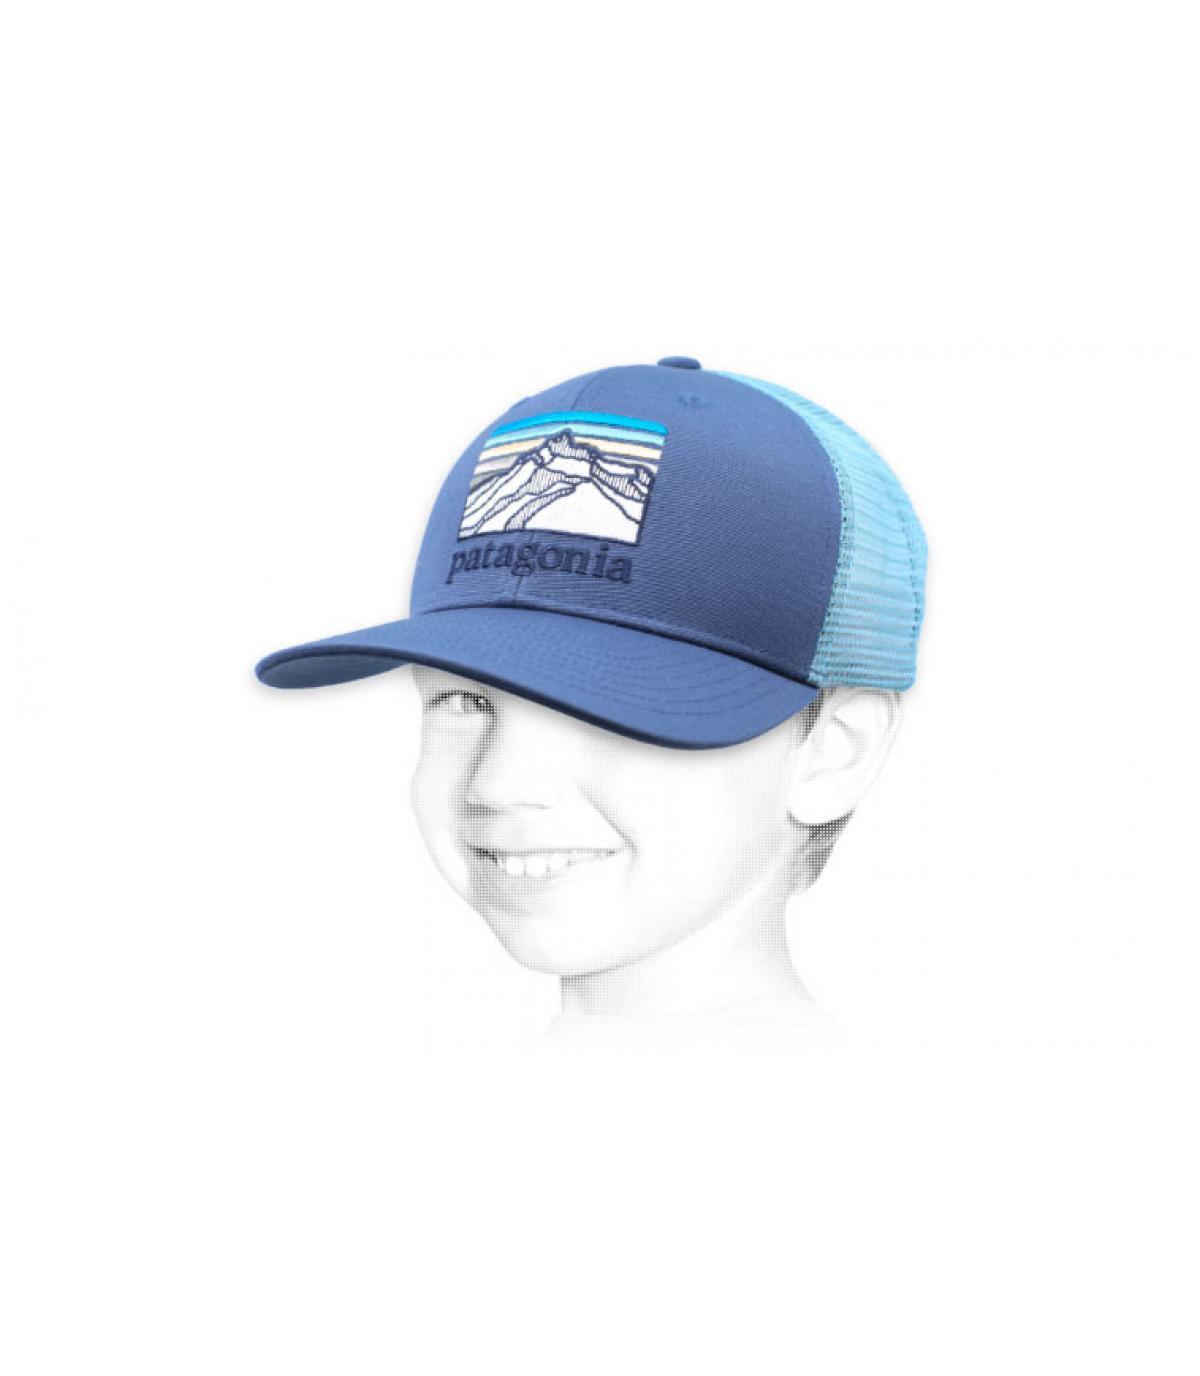 trucker enfant Patagonia bleu